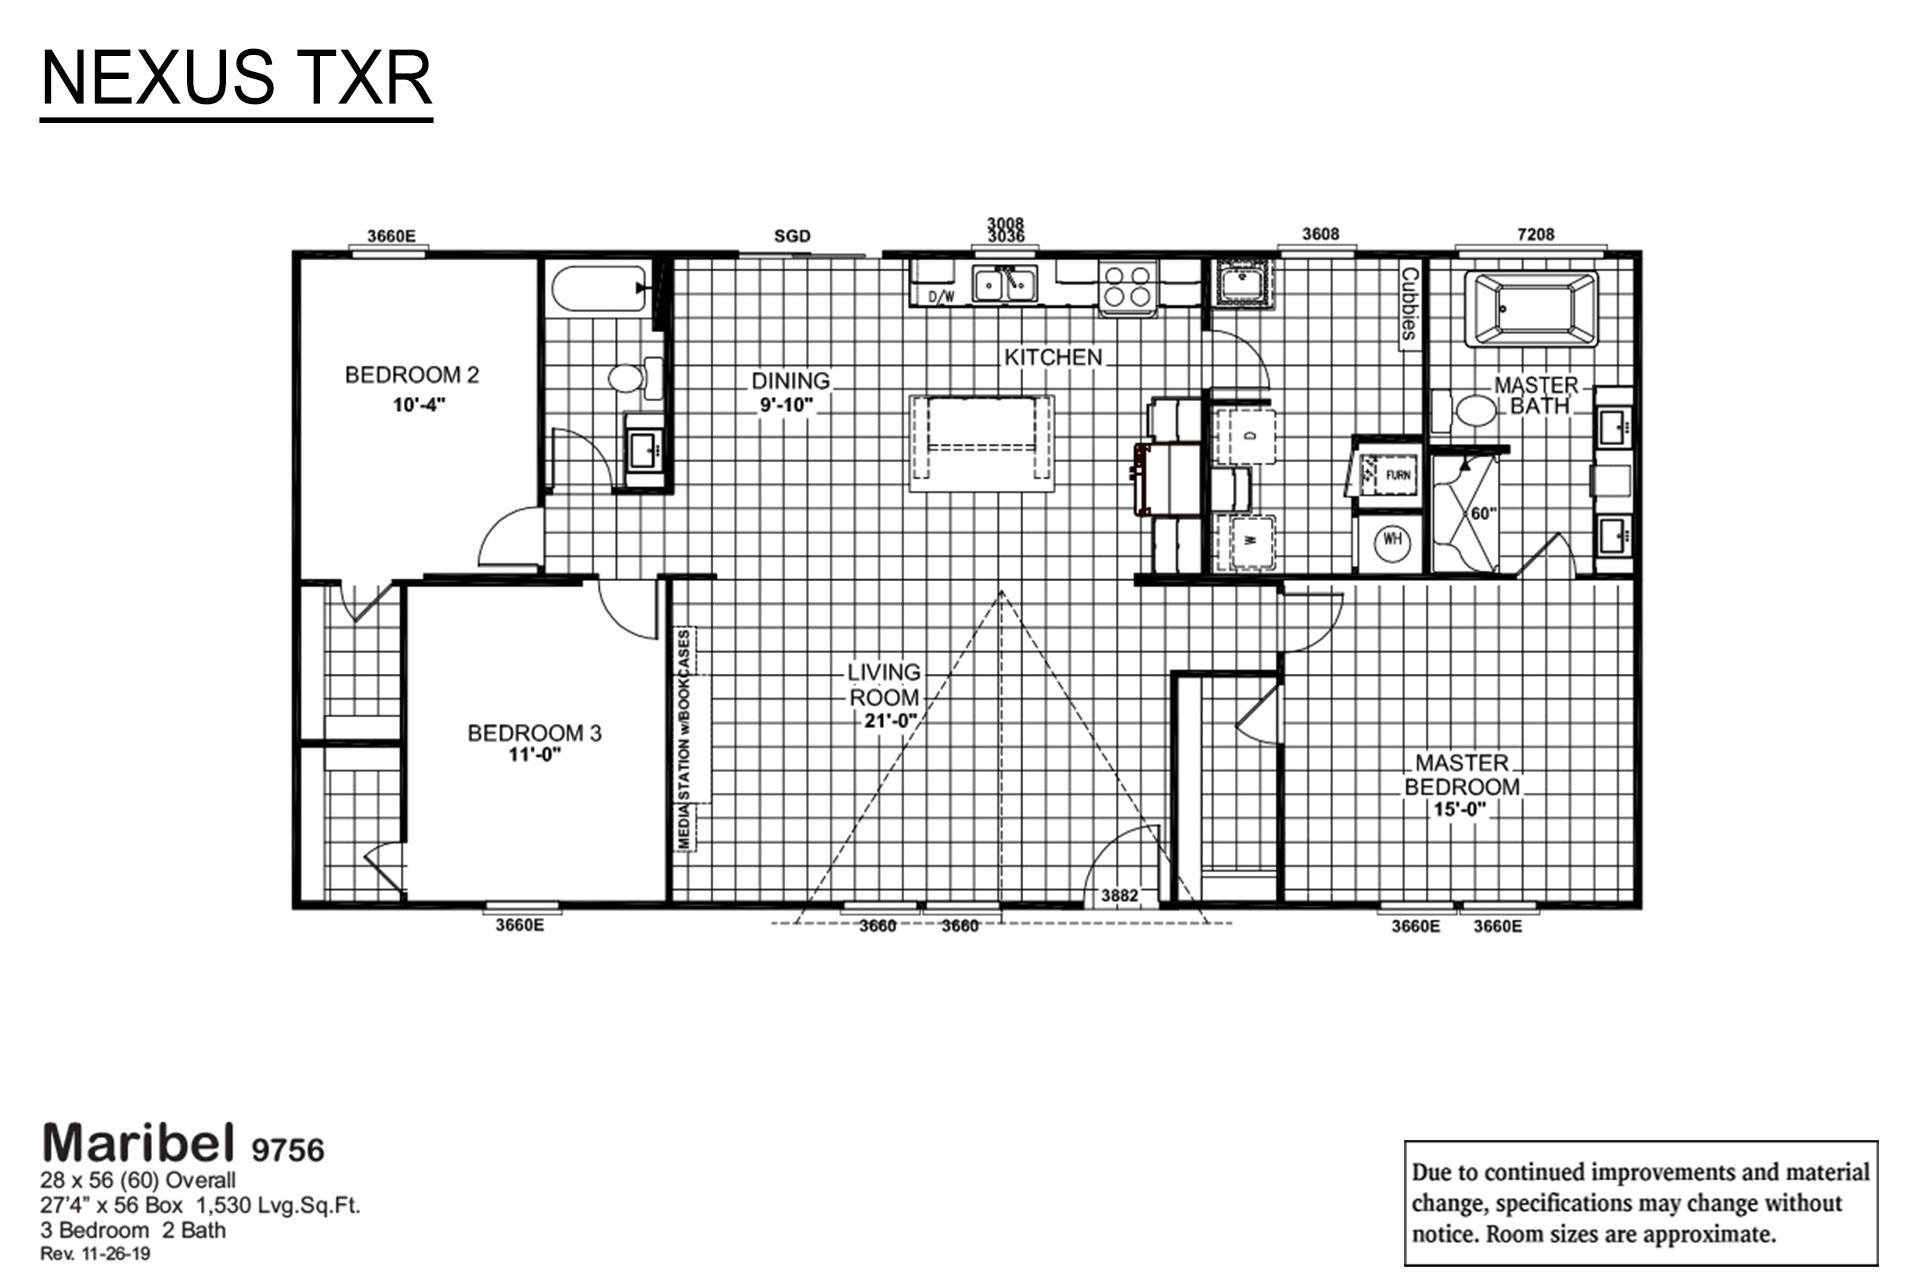 Nexus TXR Maribel 9756 Layout